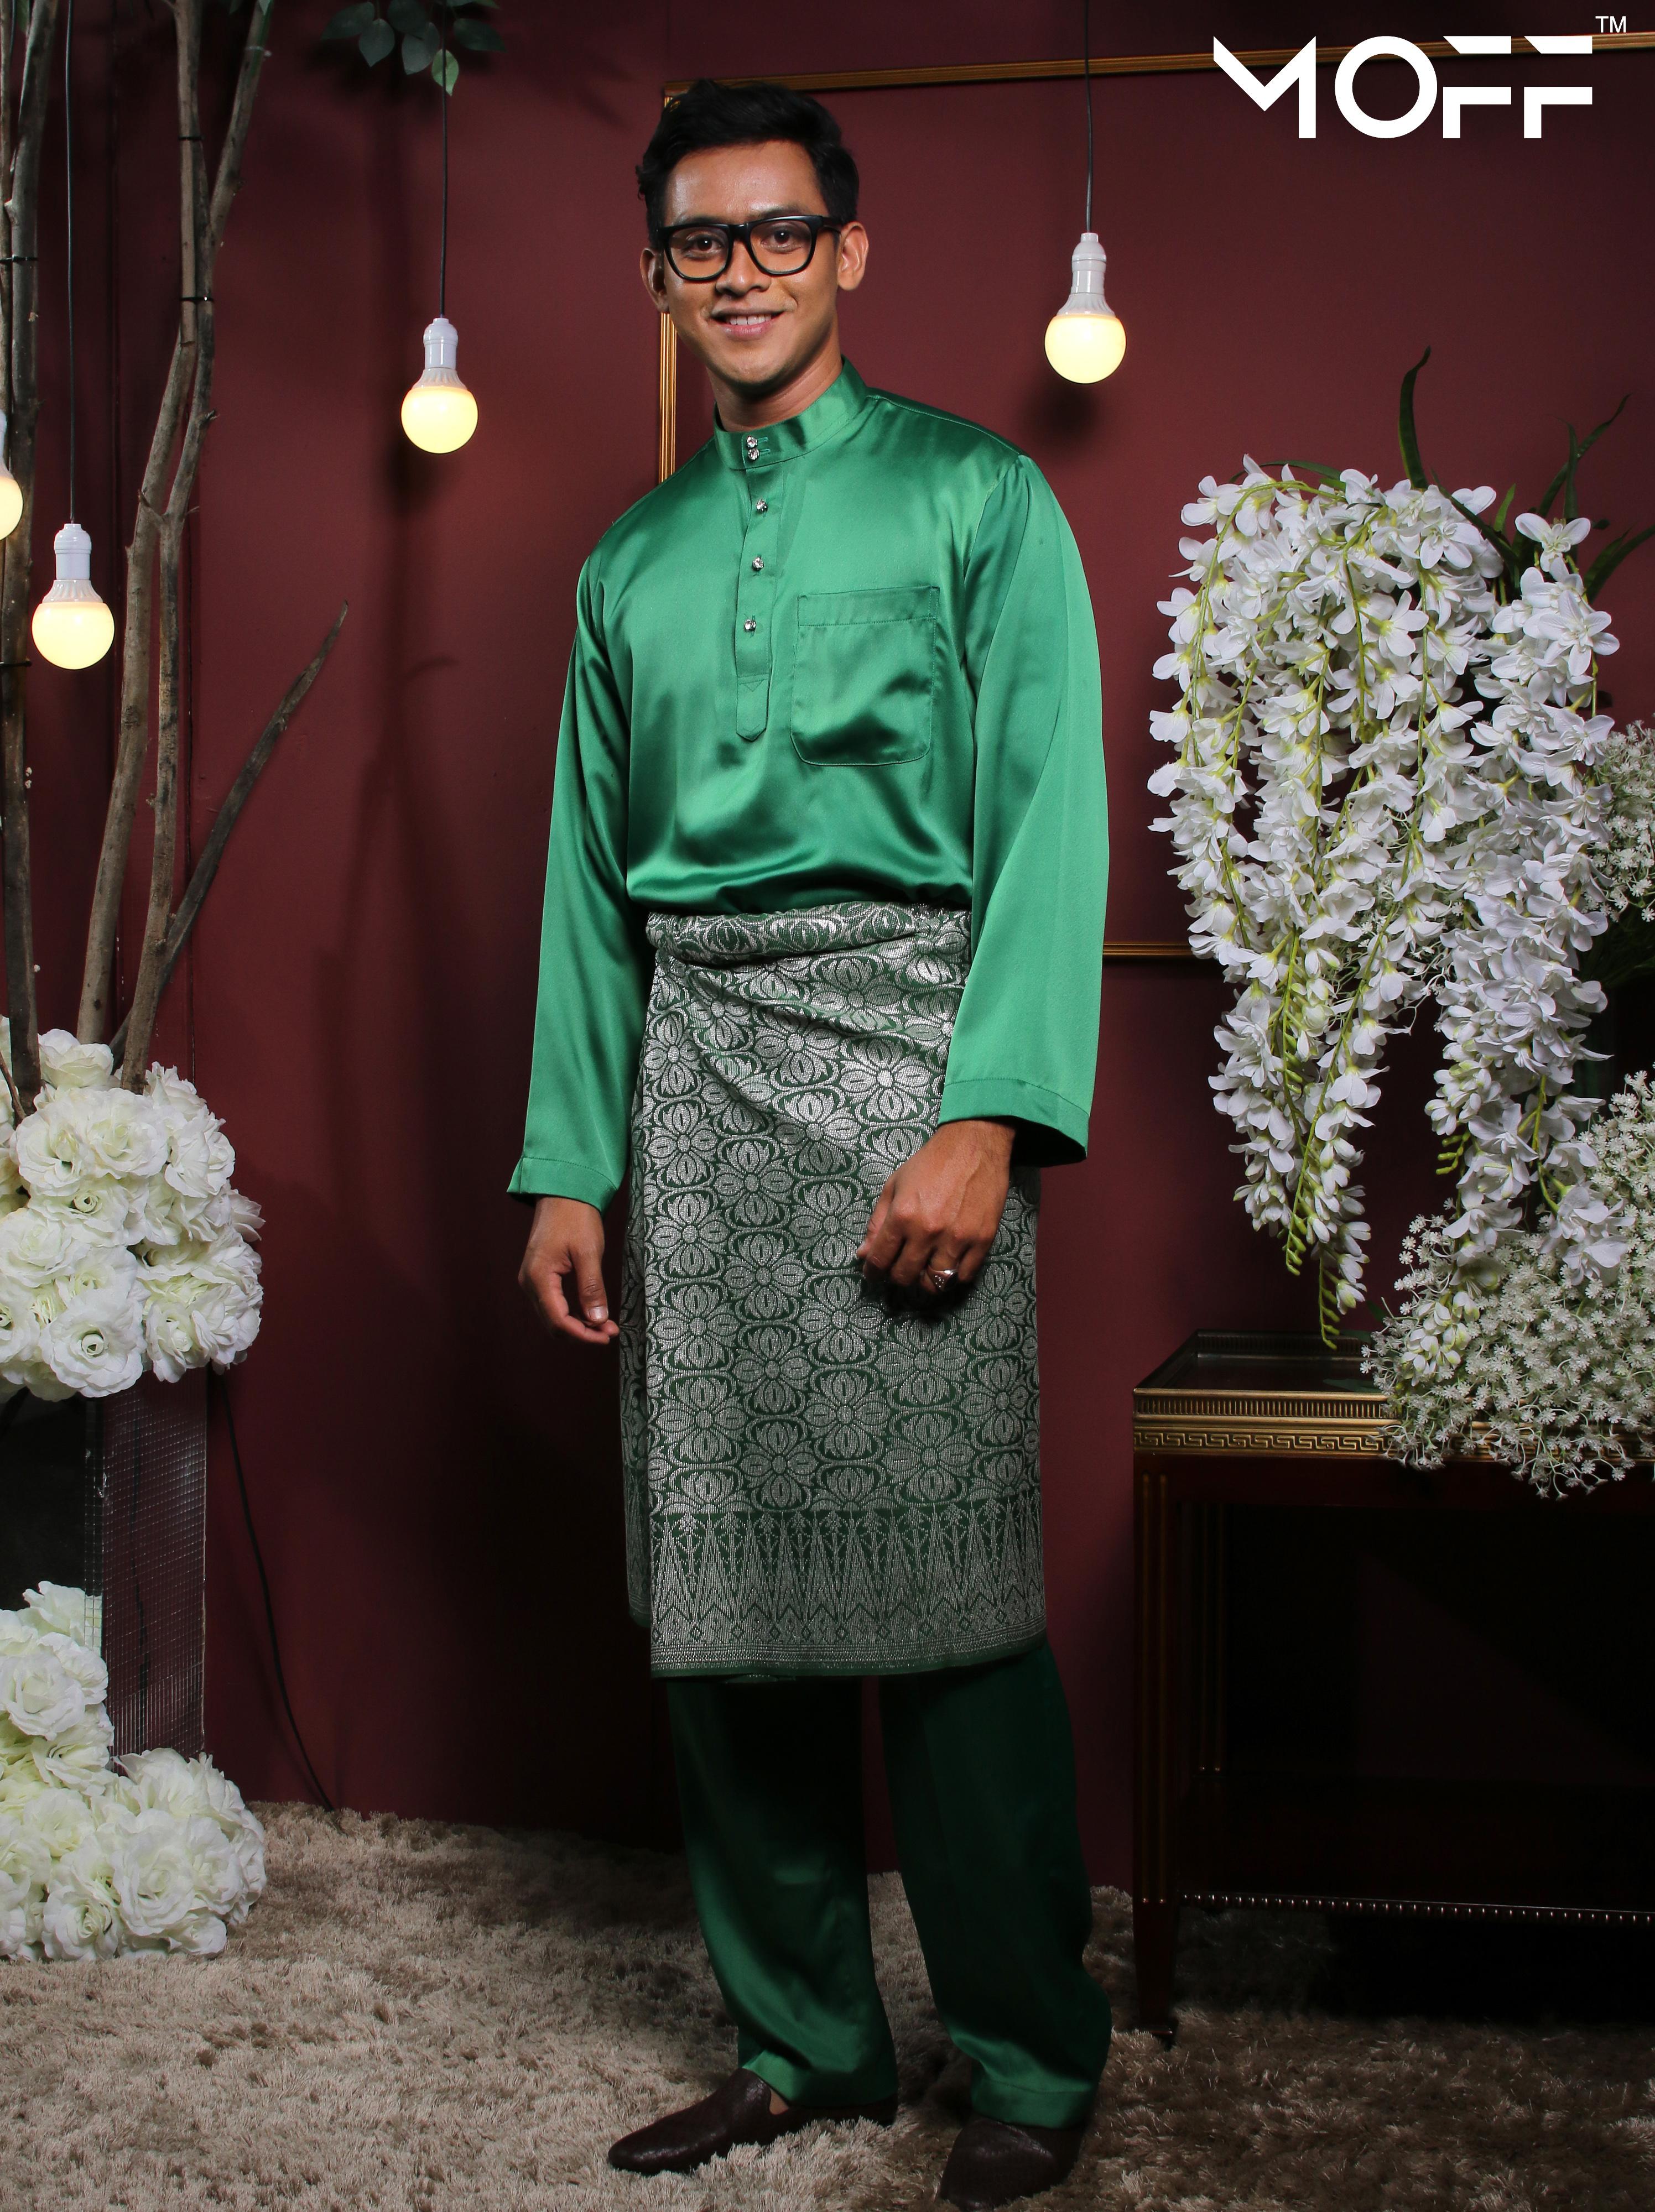 MOFF Crystal Silk Moden In Green